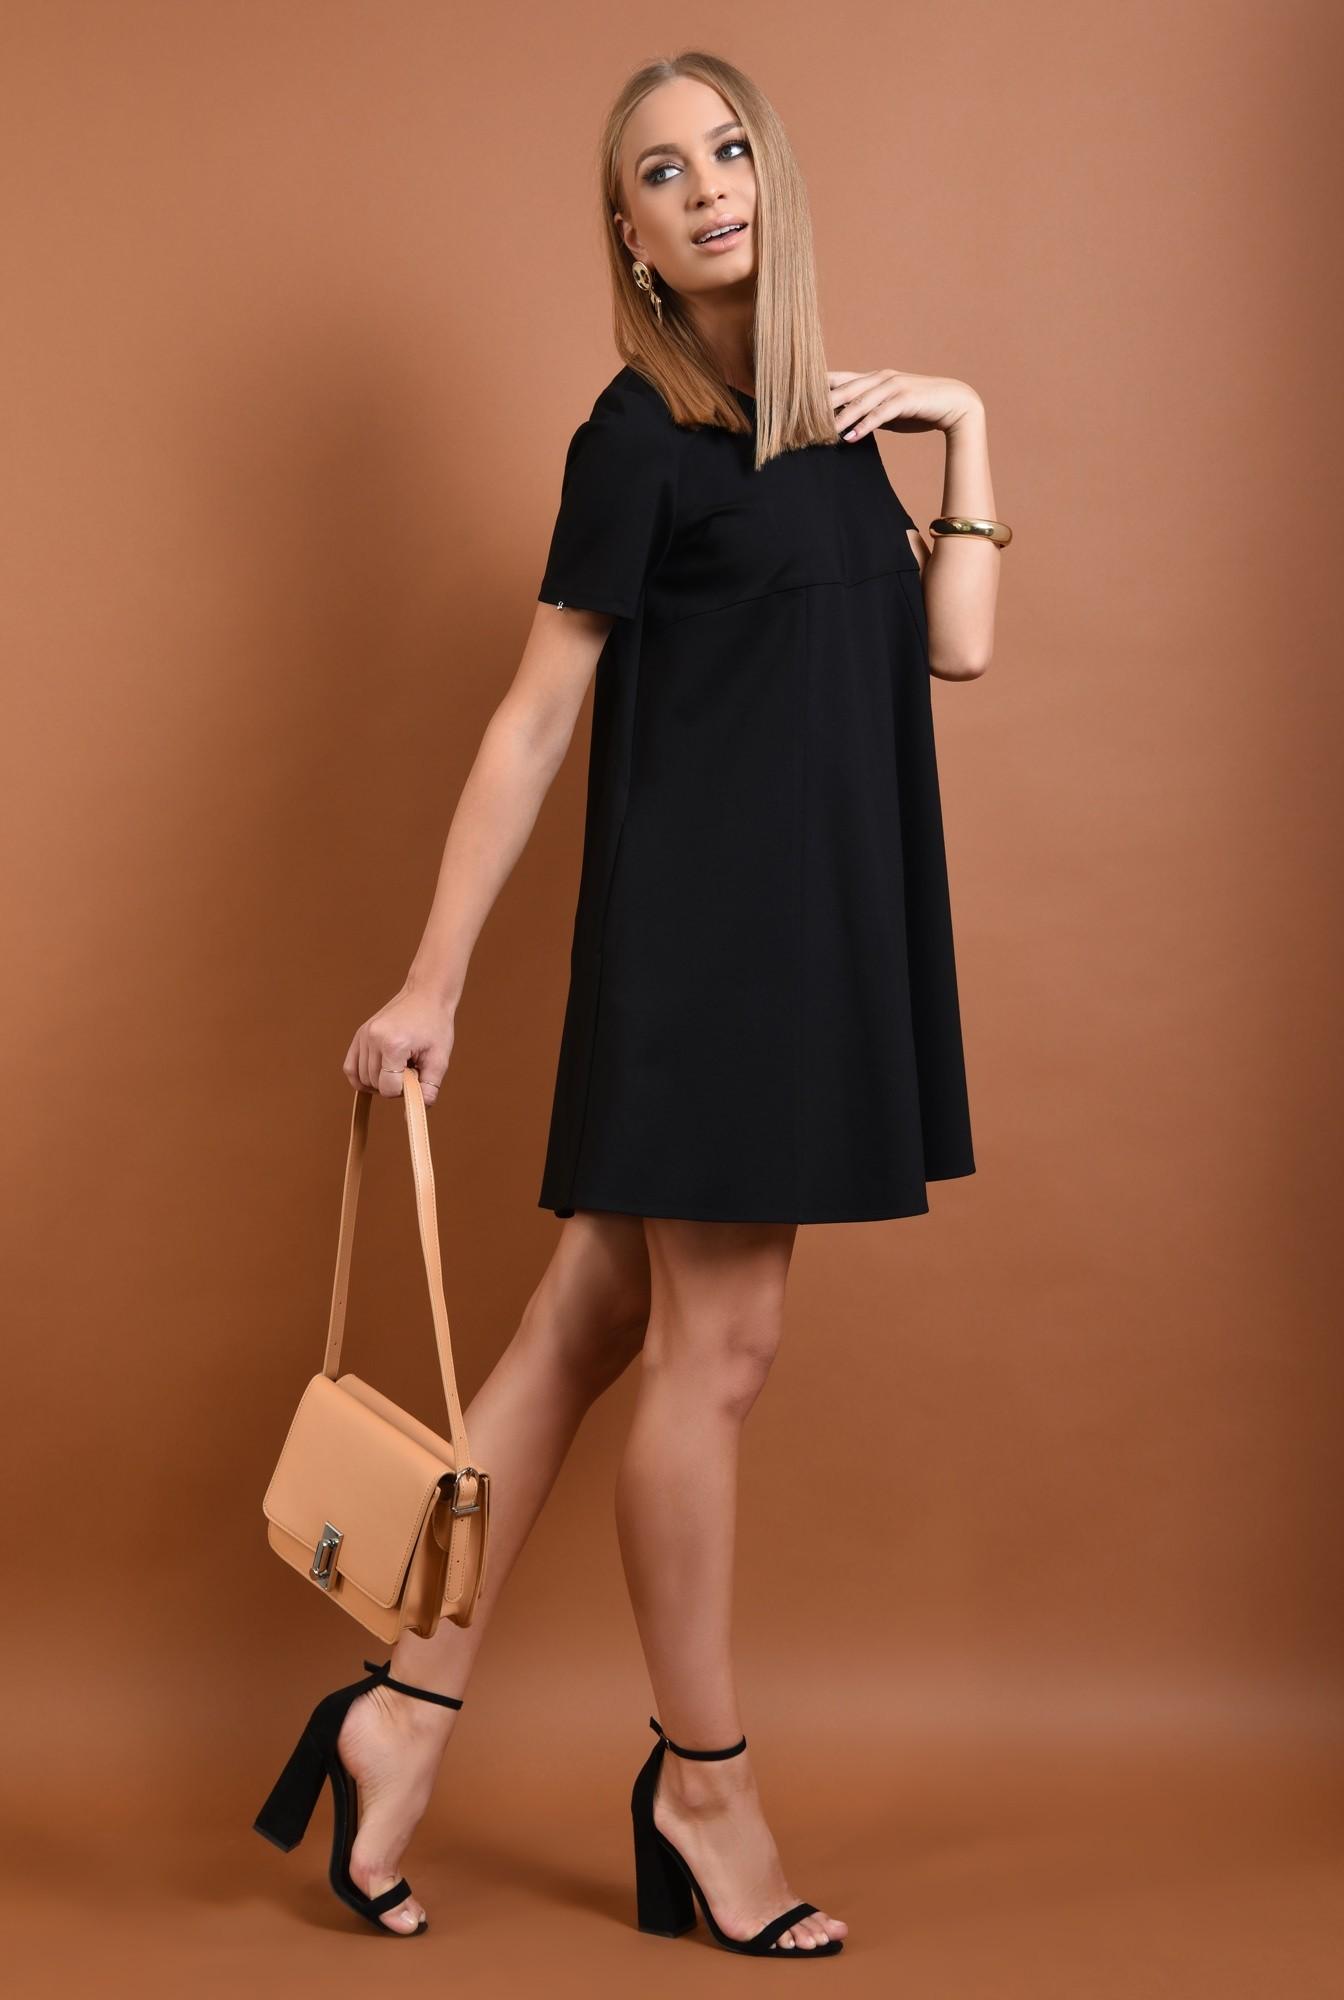 0 - rochie din tricot, neagra, scurta, croi evazat